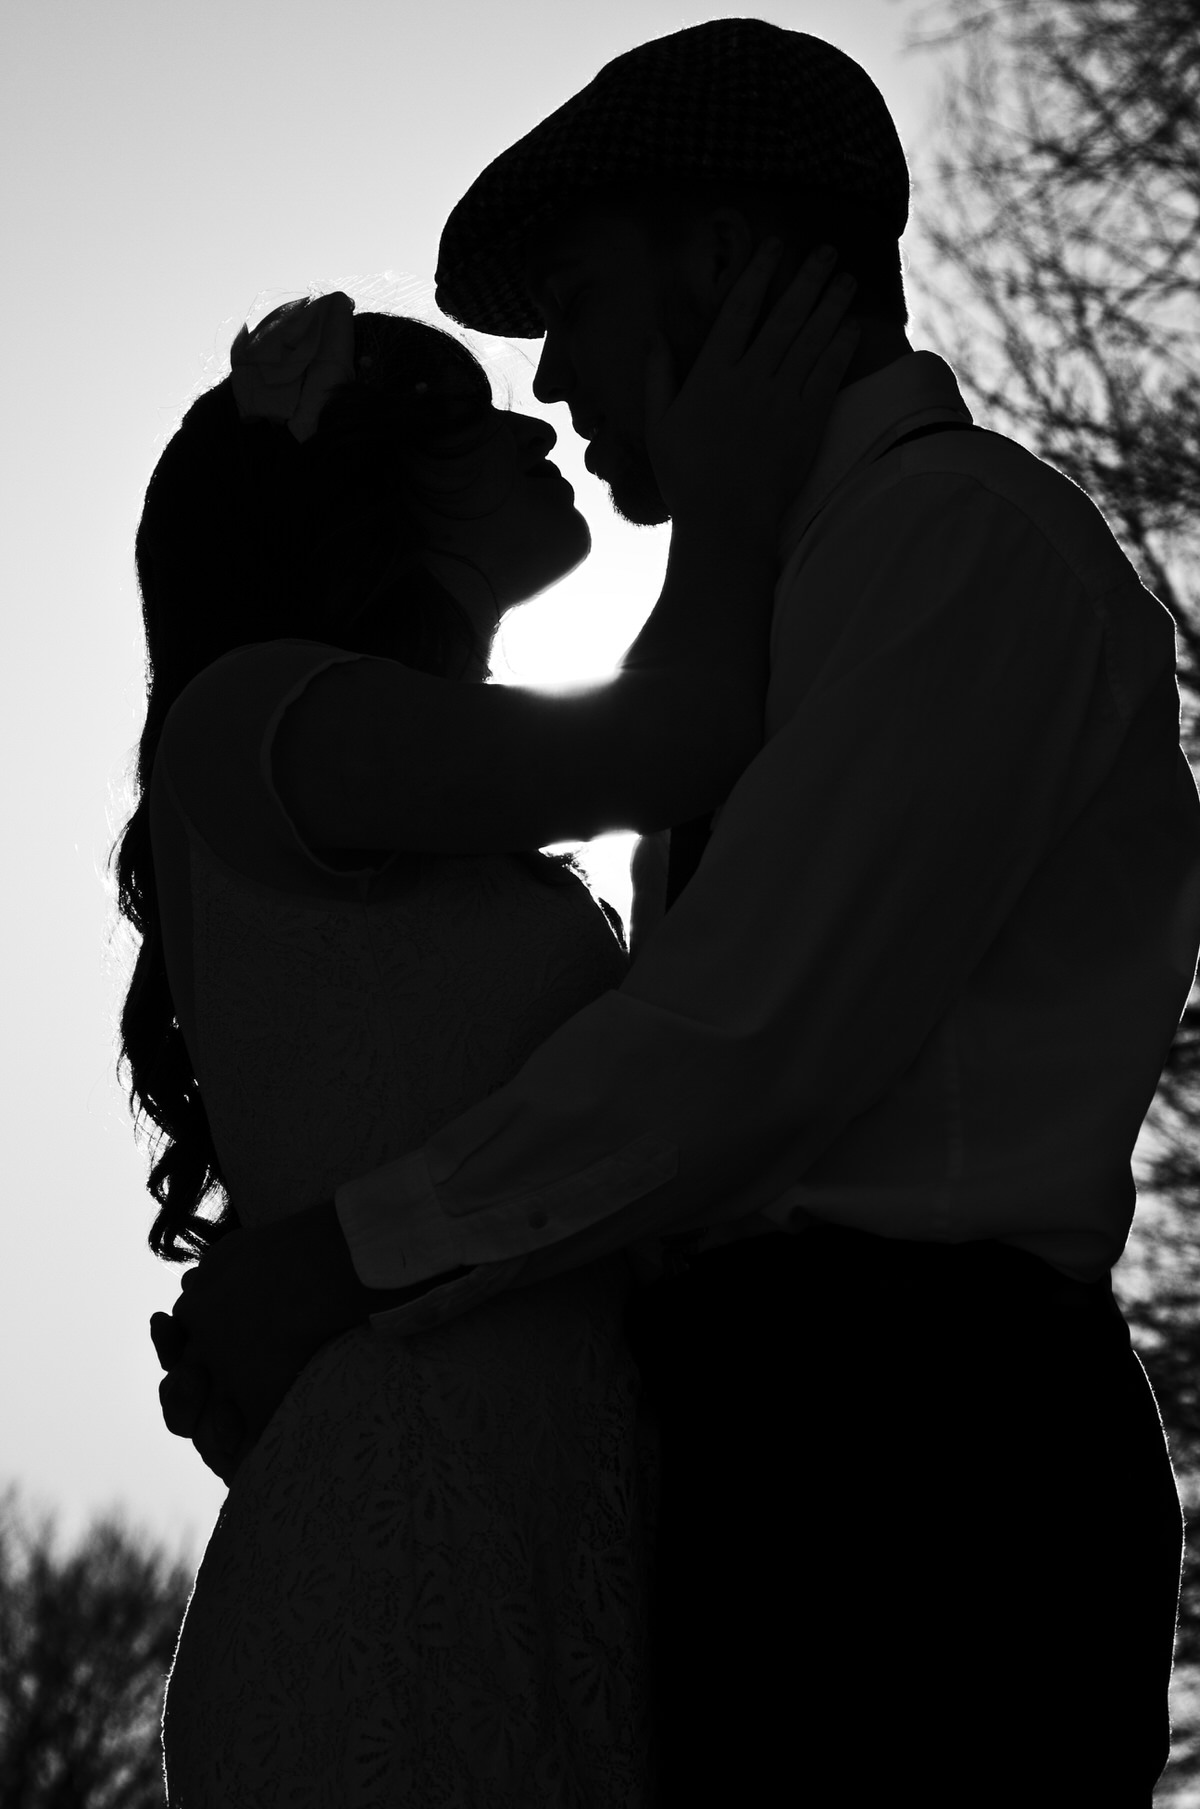 #rodneysmithphotography|,2013|,blue ridge parkway|,joel stoeltzing|,lorena fletcher|,march|,rodney smith photography|,engagement|,#rodneysmithphotography,2013,Blue Ridge Parkway,Joel Stoeltzing,Lorena Fletcher,March,Rodney Smith Photography,engagement,